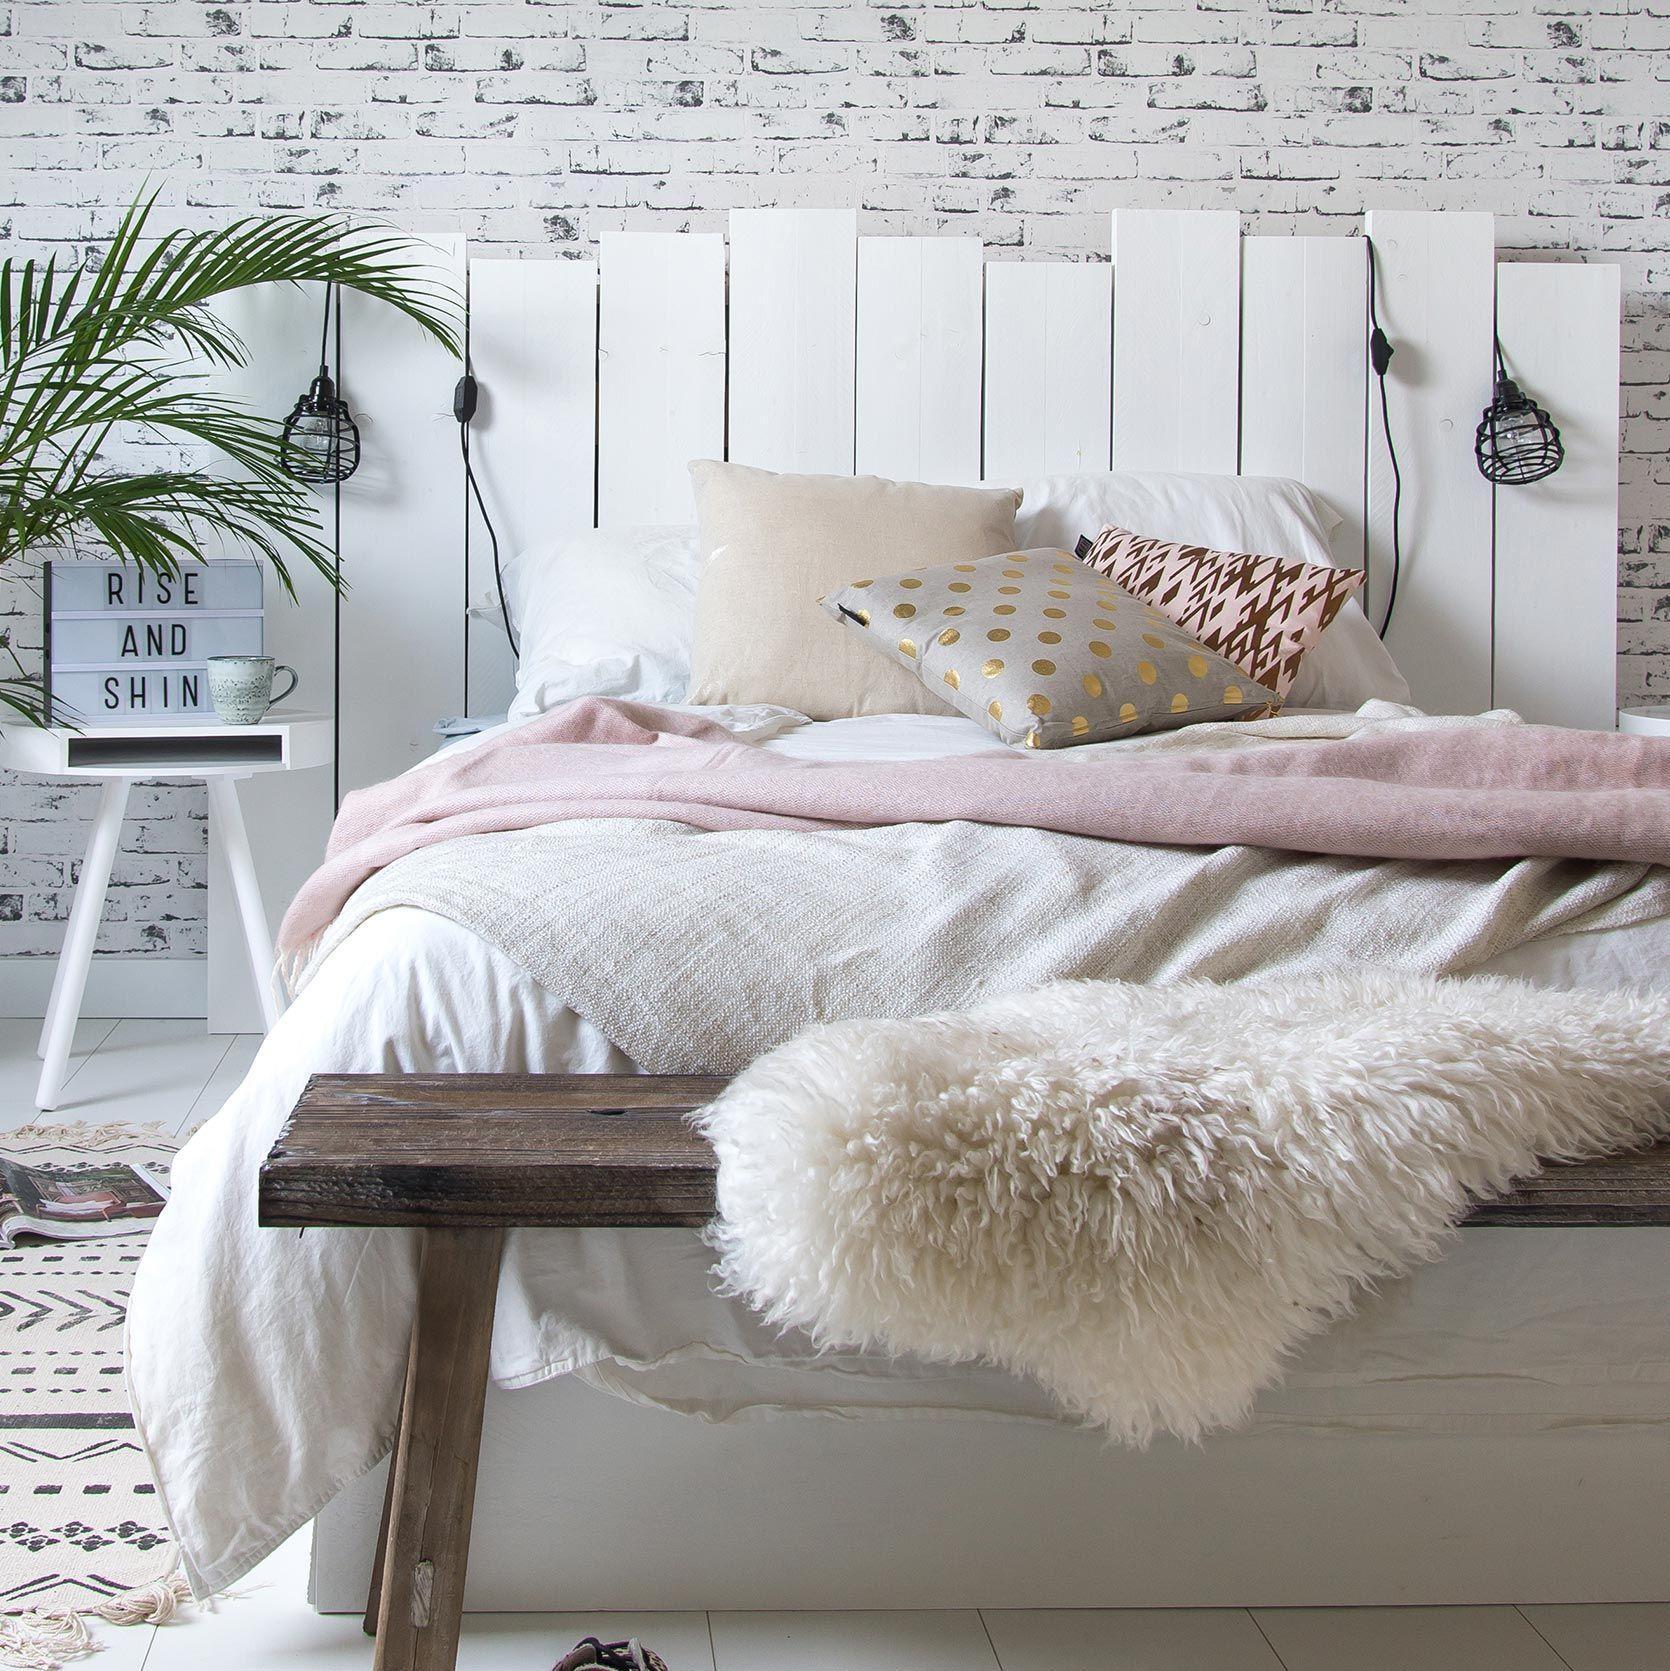 houten hoofdbord plant bankje voor bed nachtkastje. Black Bedroom Furniture Sets. Home Design Ideas